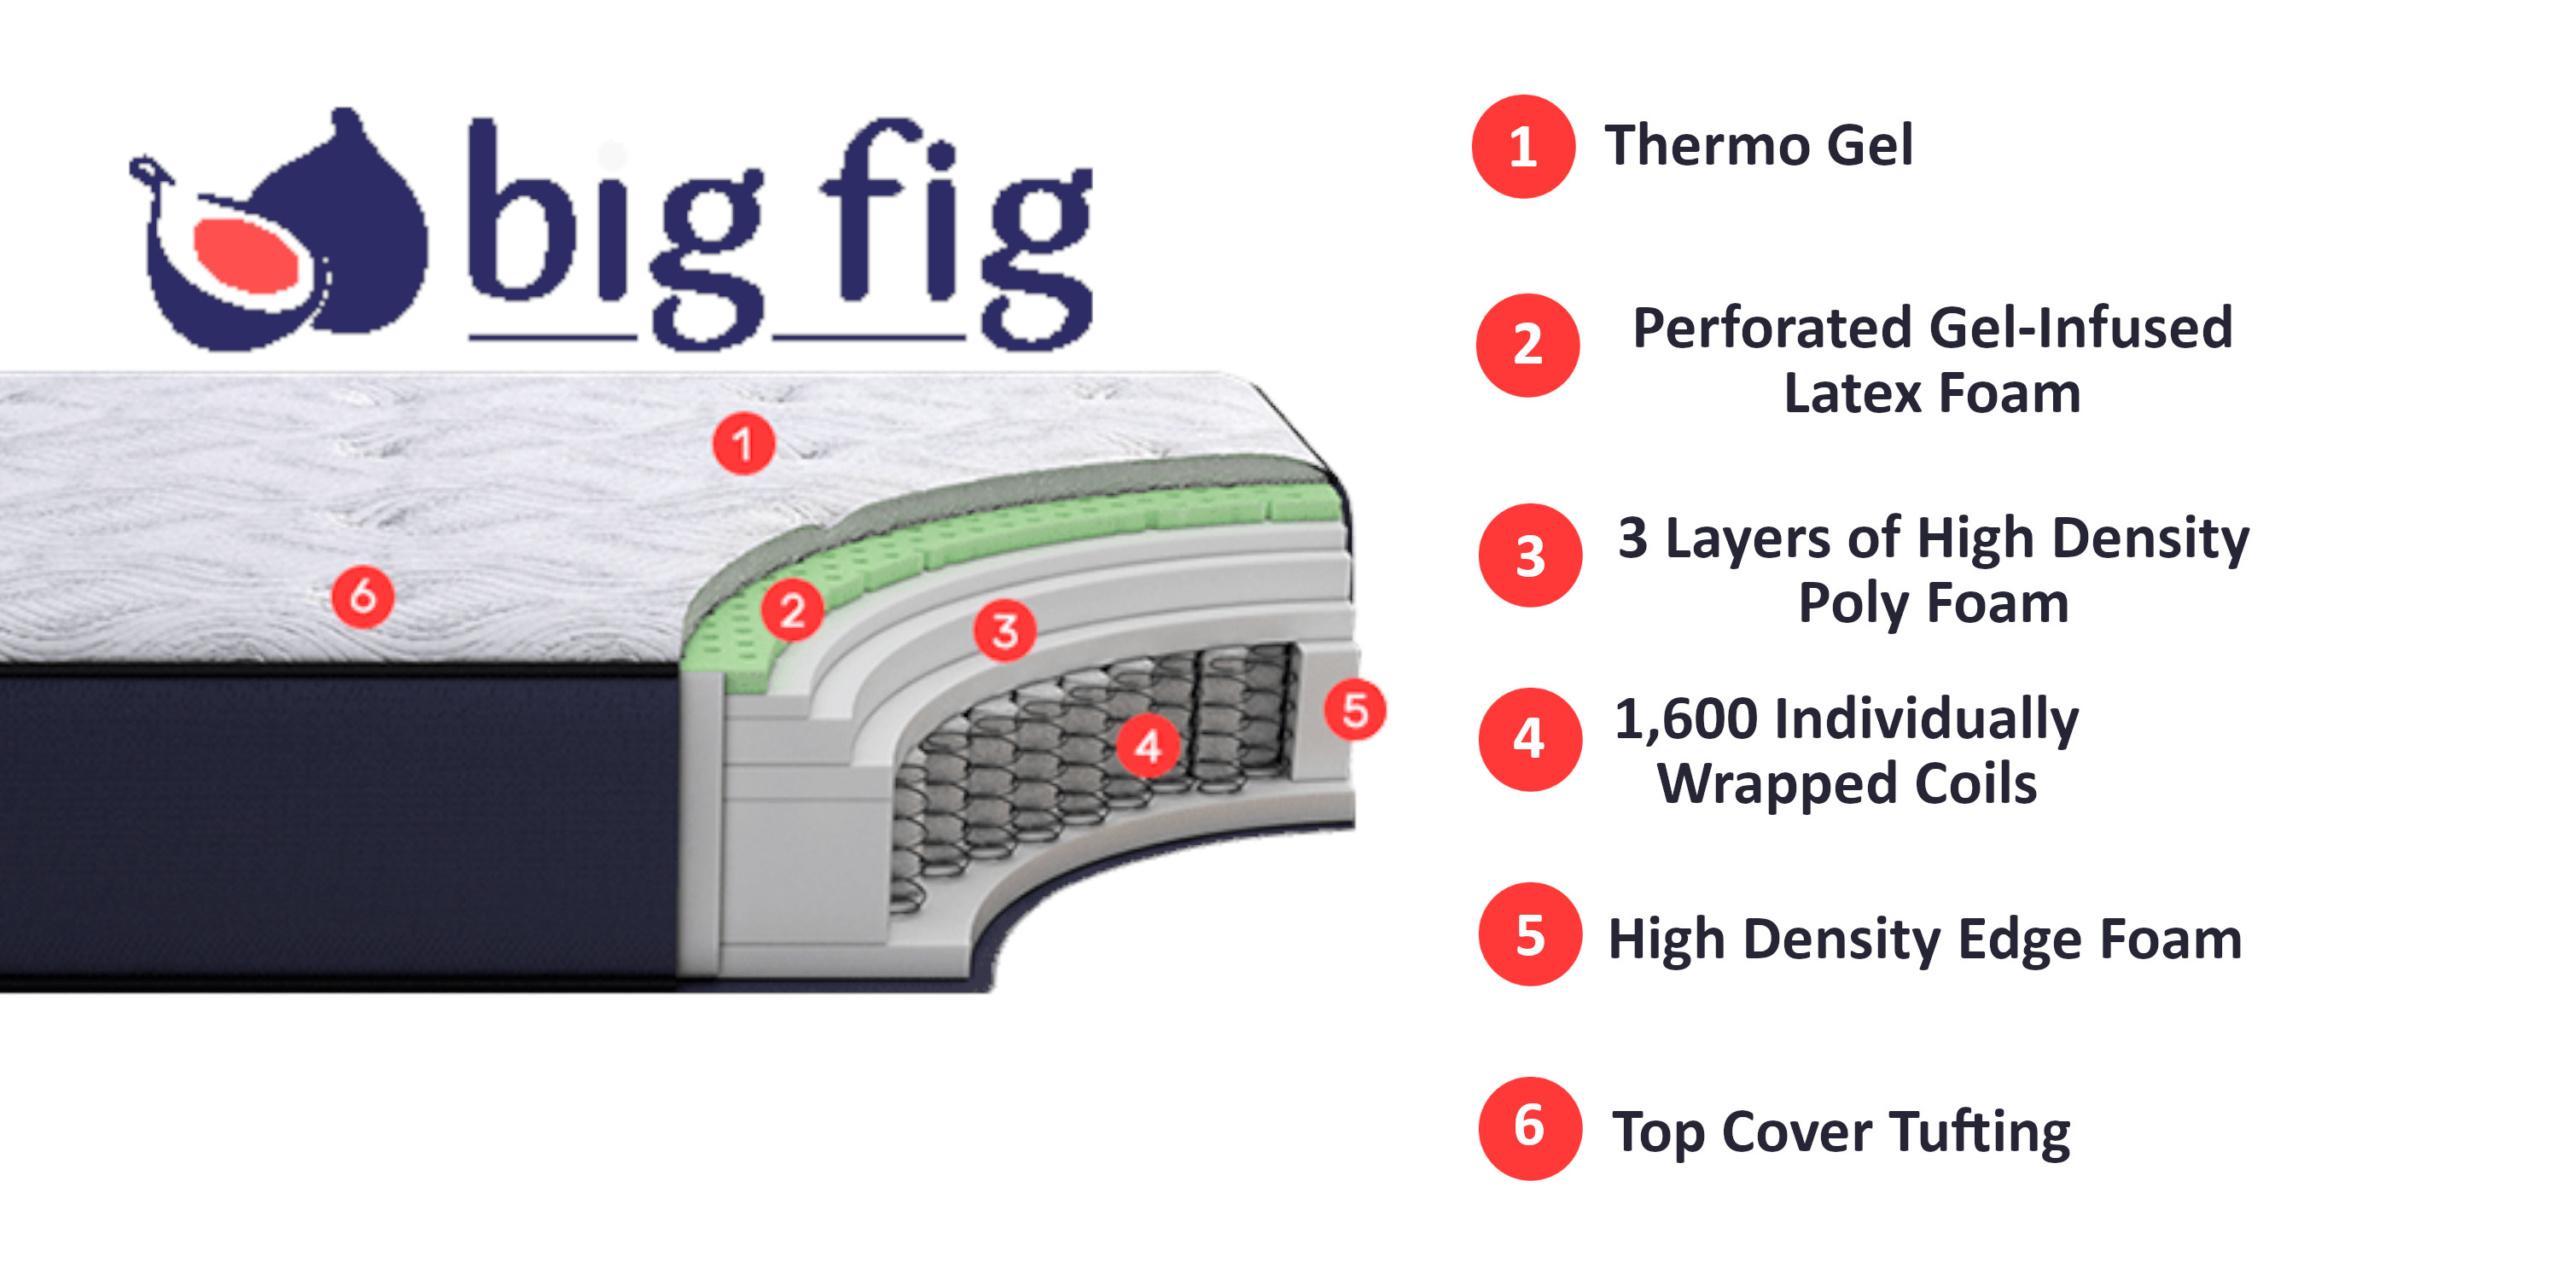 big fig mattress layers and materials